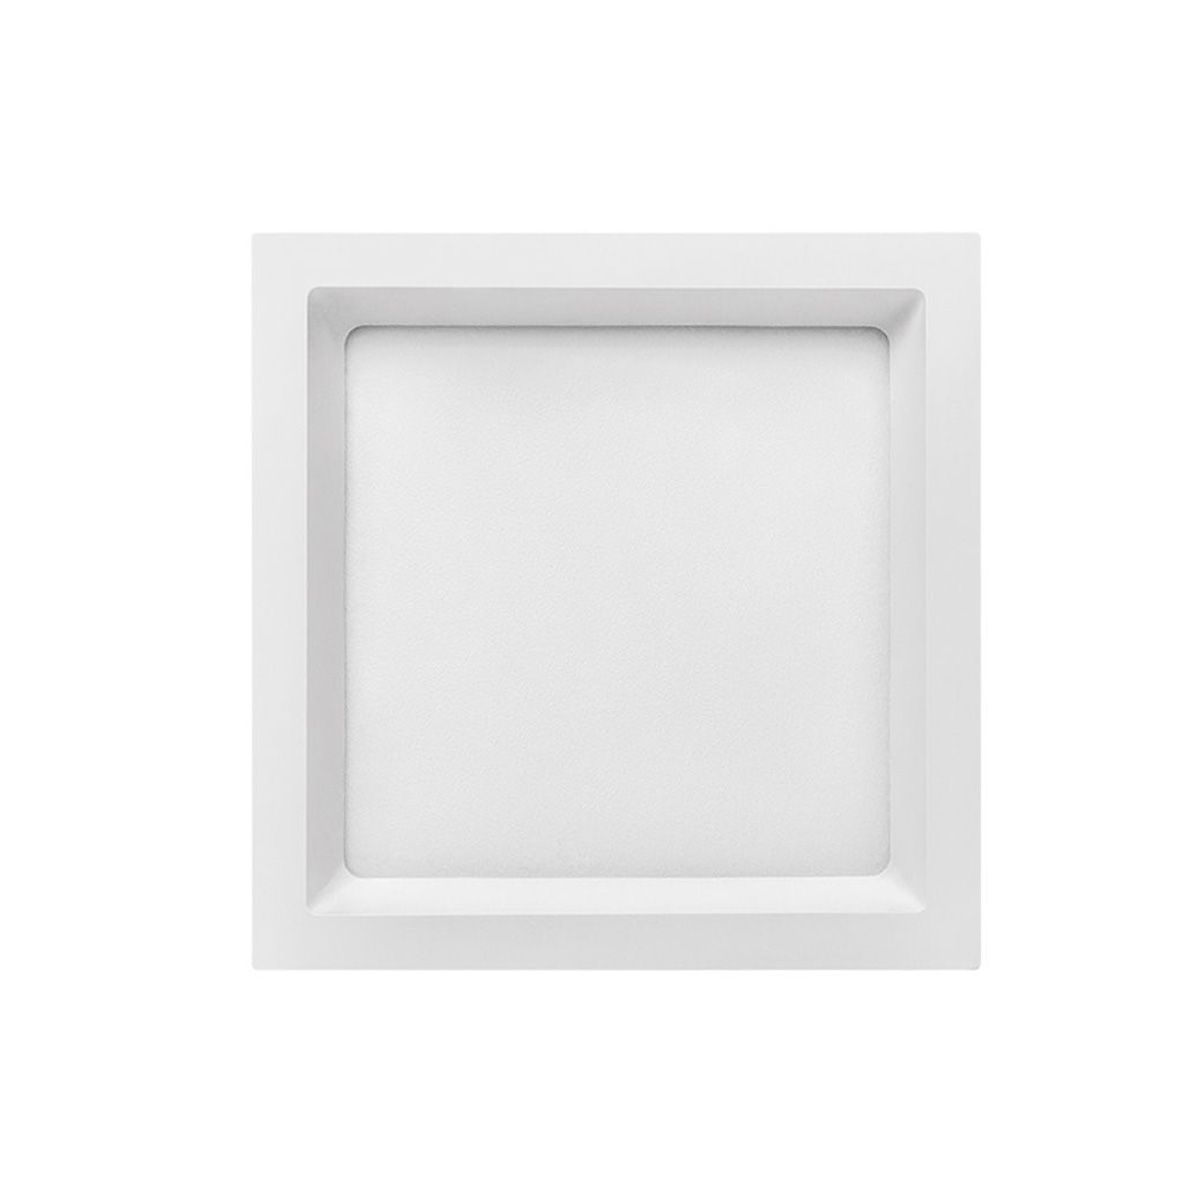 Painel Led Embutir 24w Recuado Stella Deep 26,2x26,2cm Sth8904